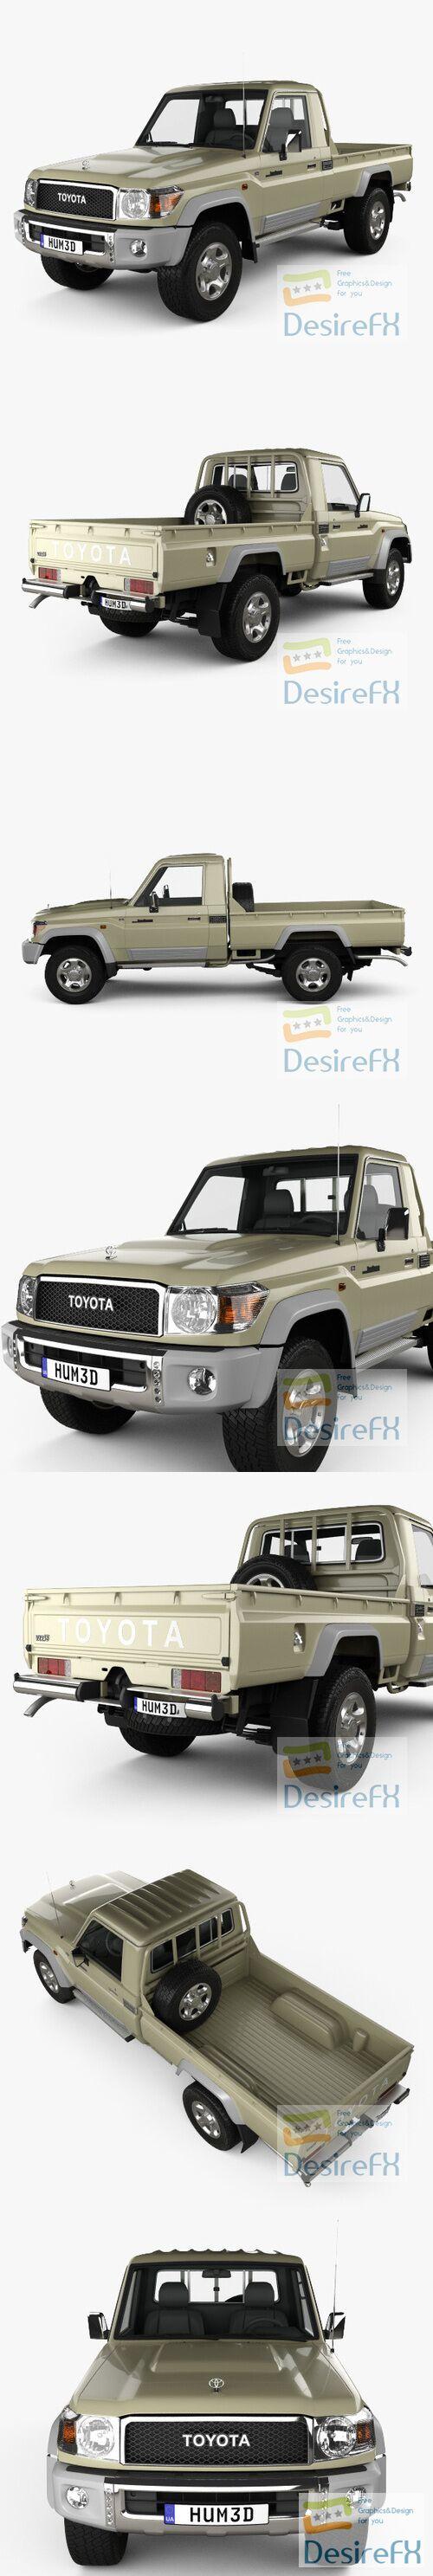 Toyota Land Cruiser Single Cab Pickup VXR 2007 3D Model